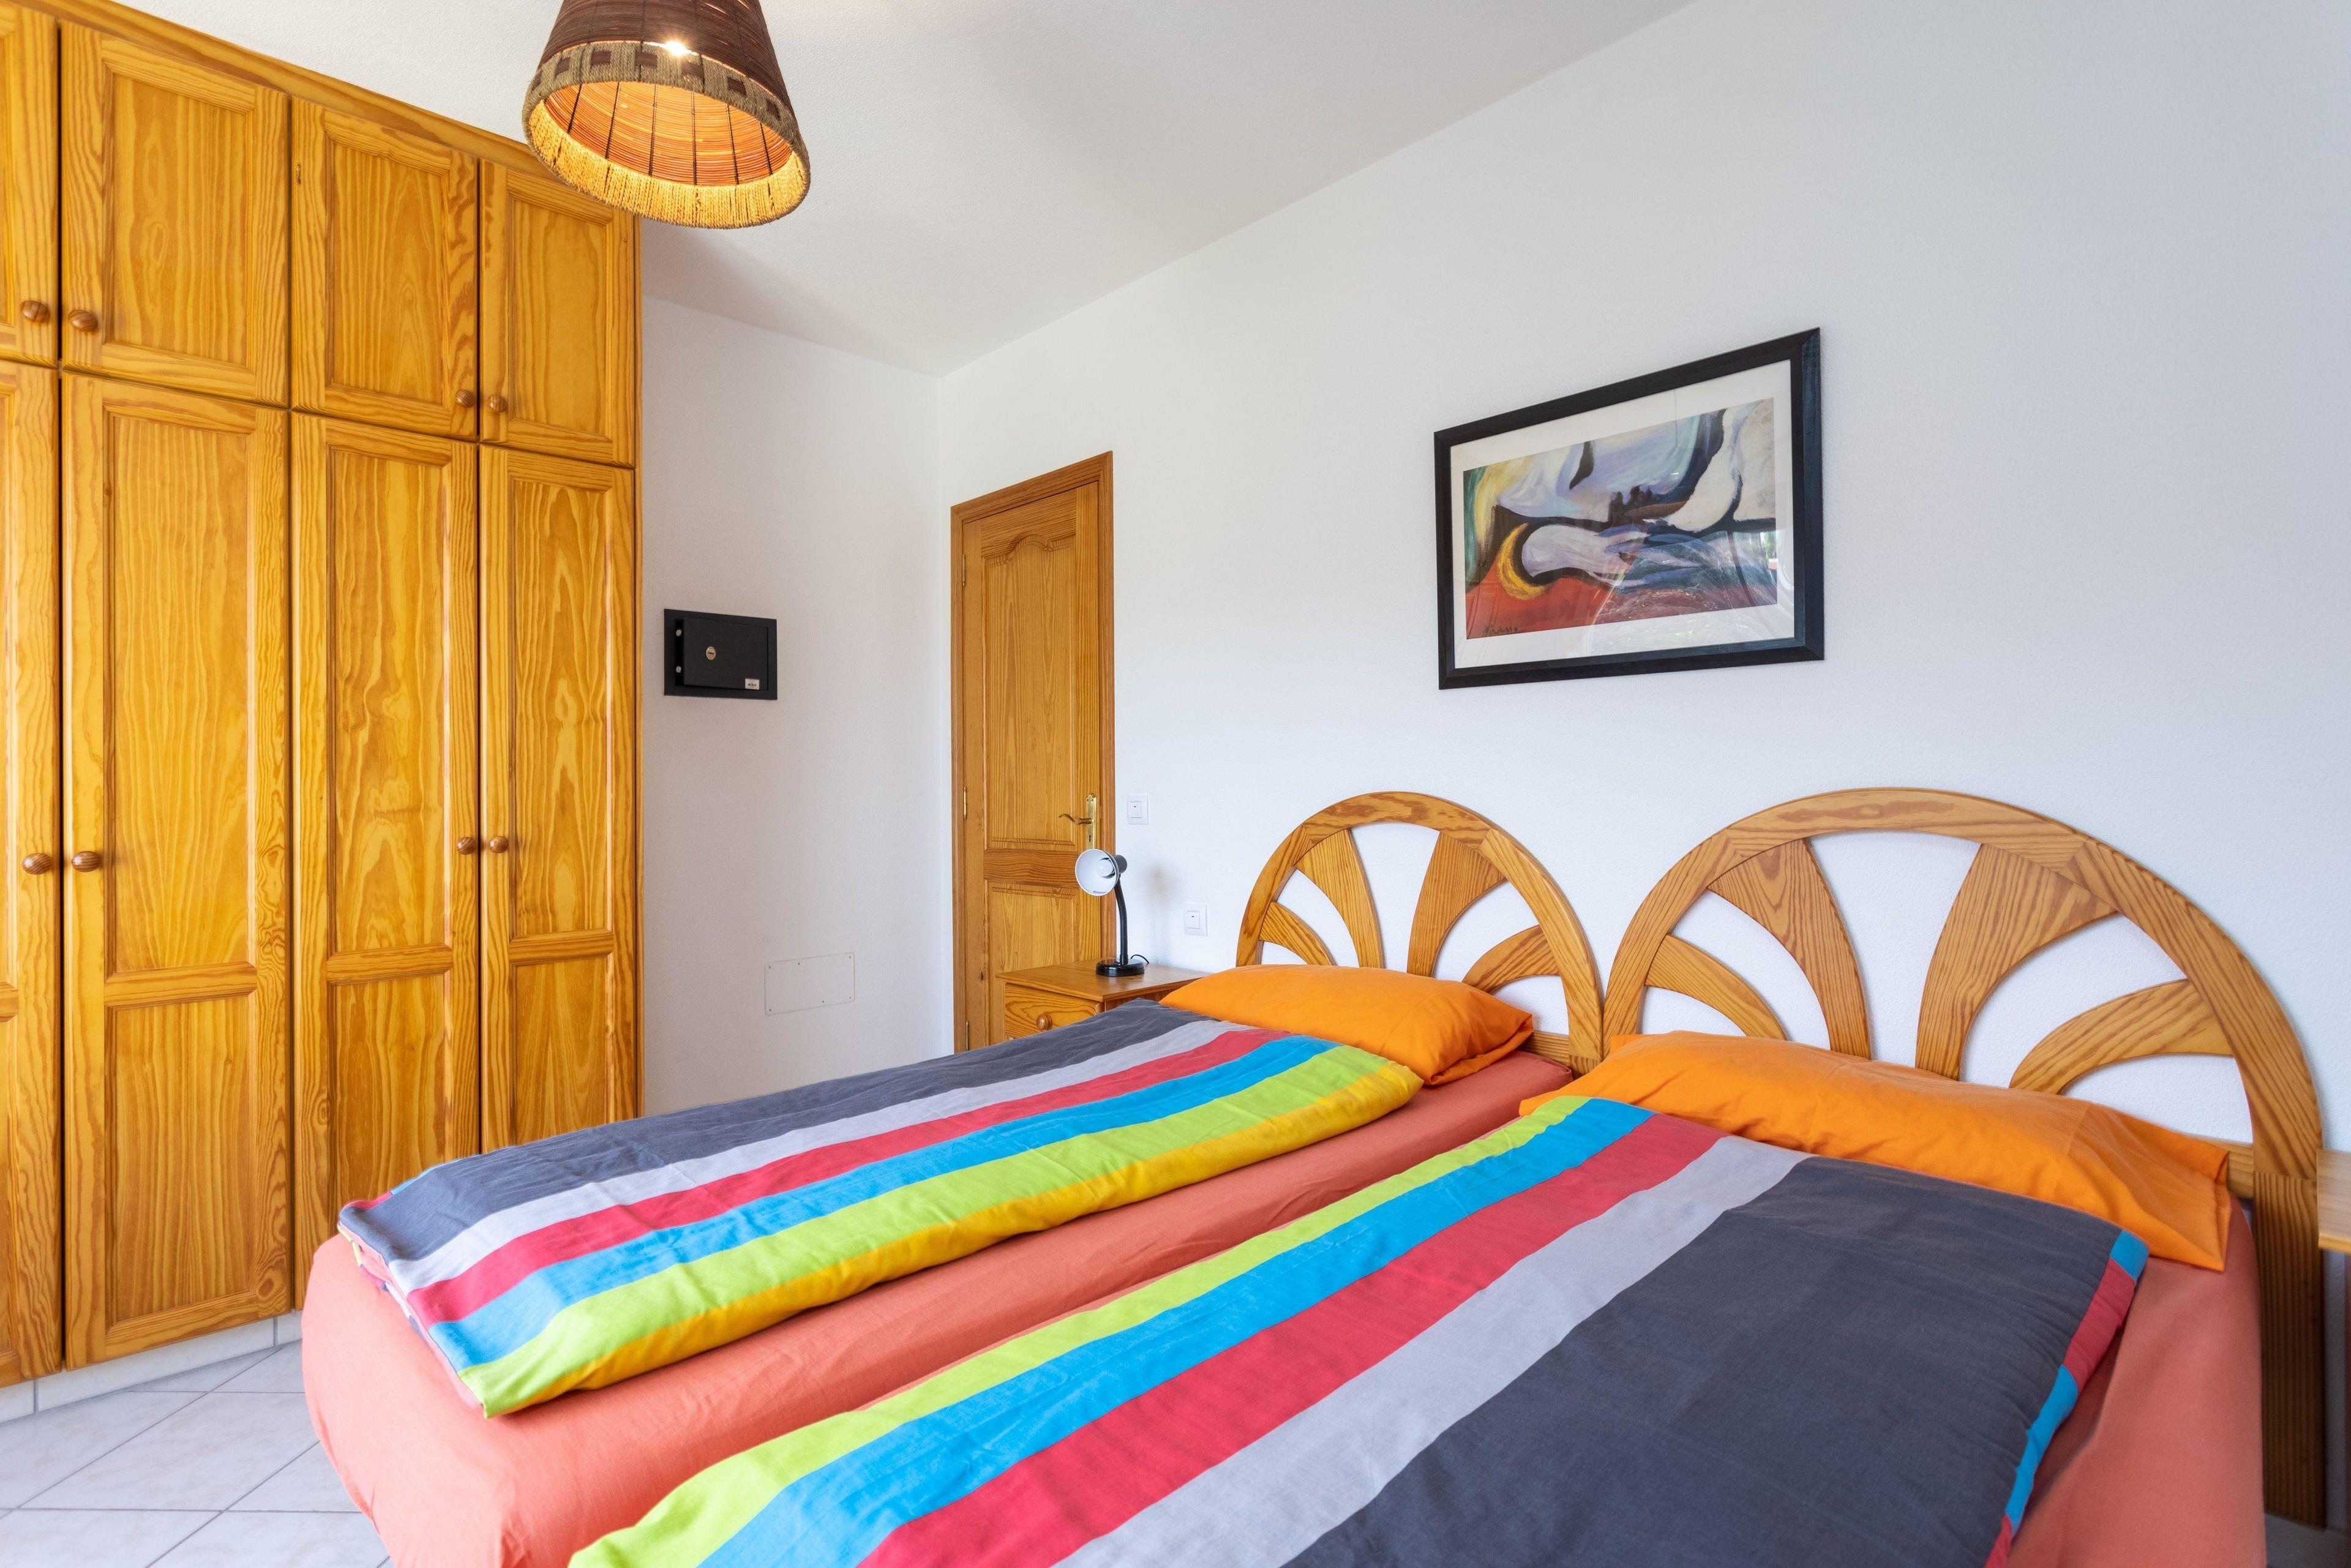 Appartement de vacances Fewo Atico Florasol, sehr ruhig direkt am Naturschutzgebiet, mit Pool, 2 Terrassen, Grill, (2492983), Santa Ursula, Ténérife, Iles Canaries, Espagne, image 9